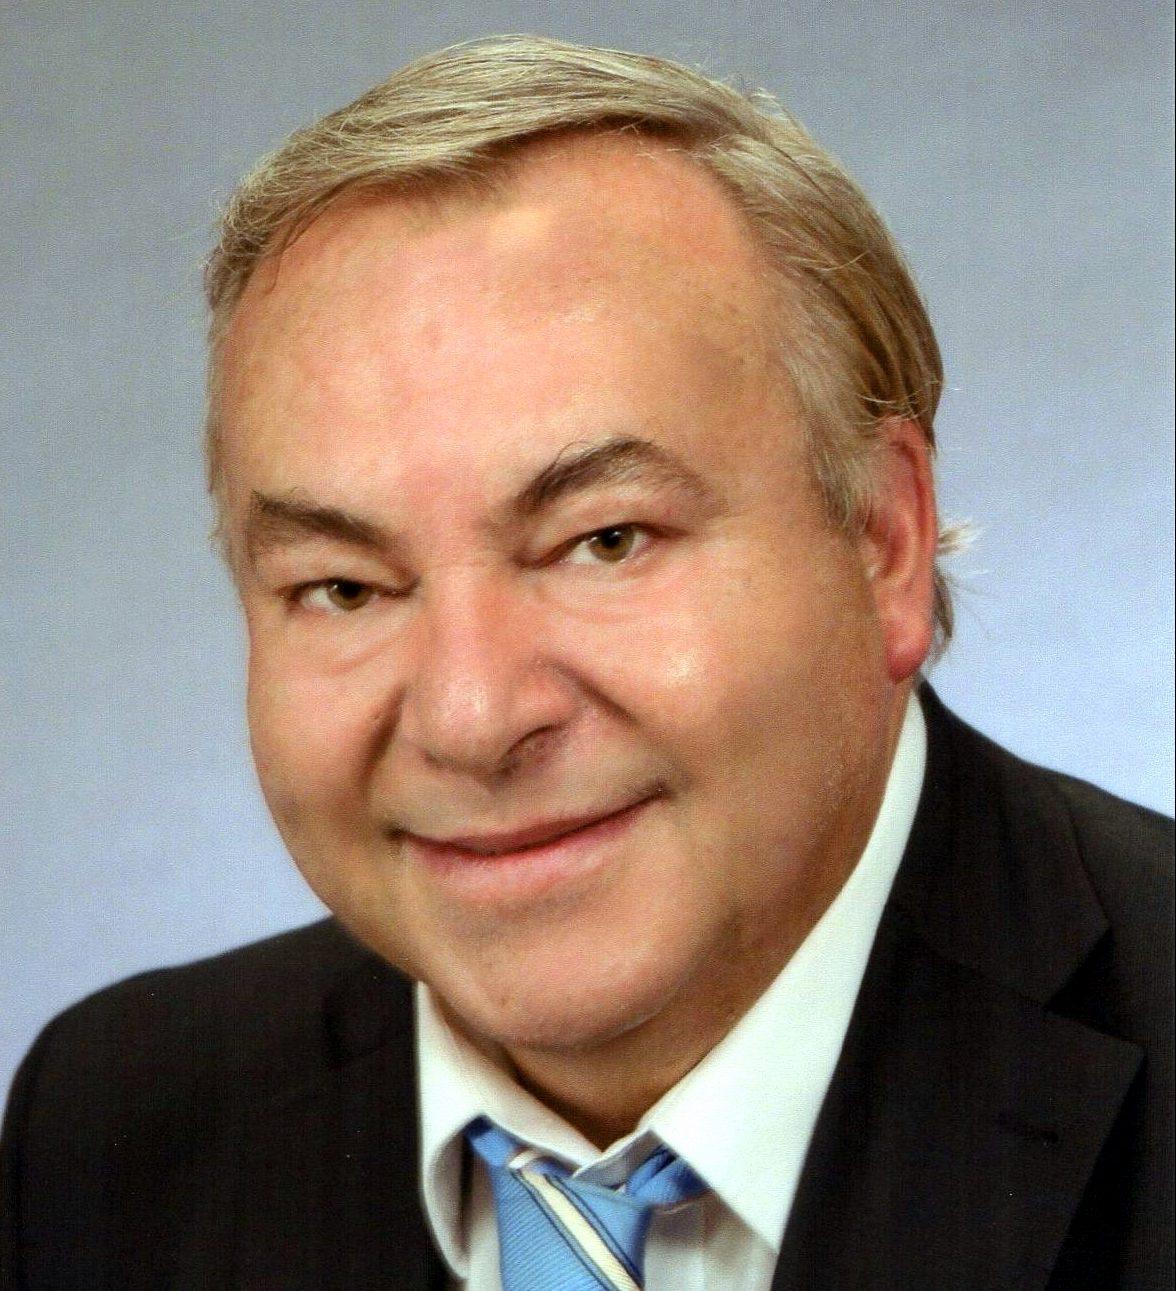 Kontakt Rudolf Spanner, Export Manager bei TrigasFI